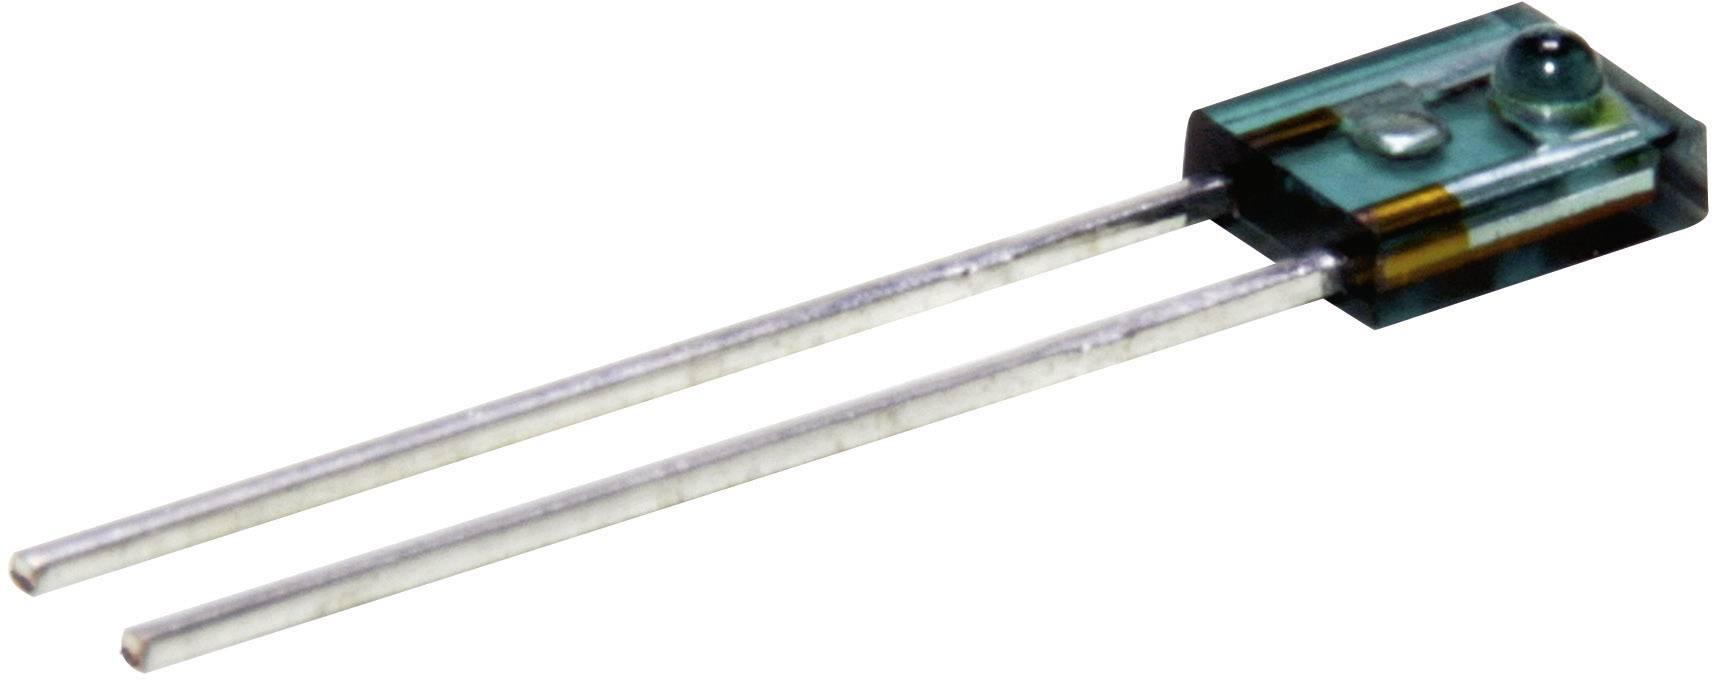 IR reflektor Honeywell SEP8706-003, 880 nm, 50 °, 4.45 x 5.72 mm, radiálne vývody